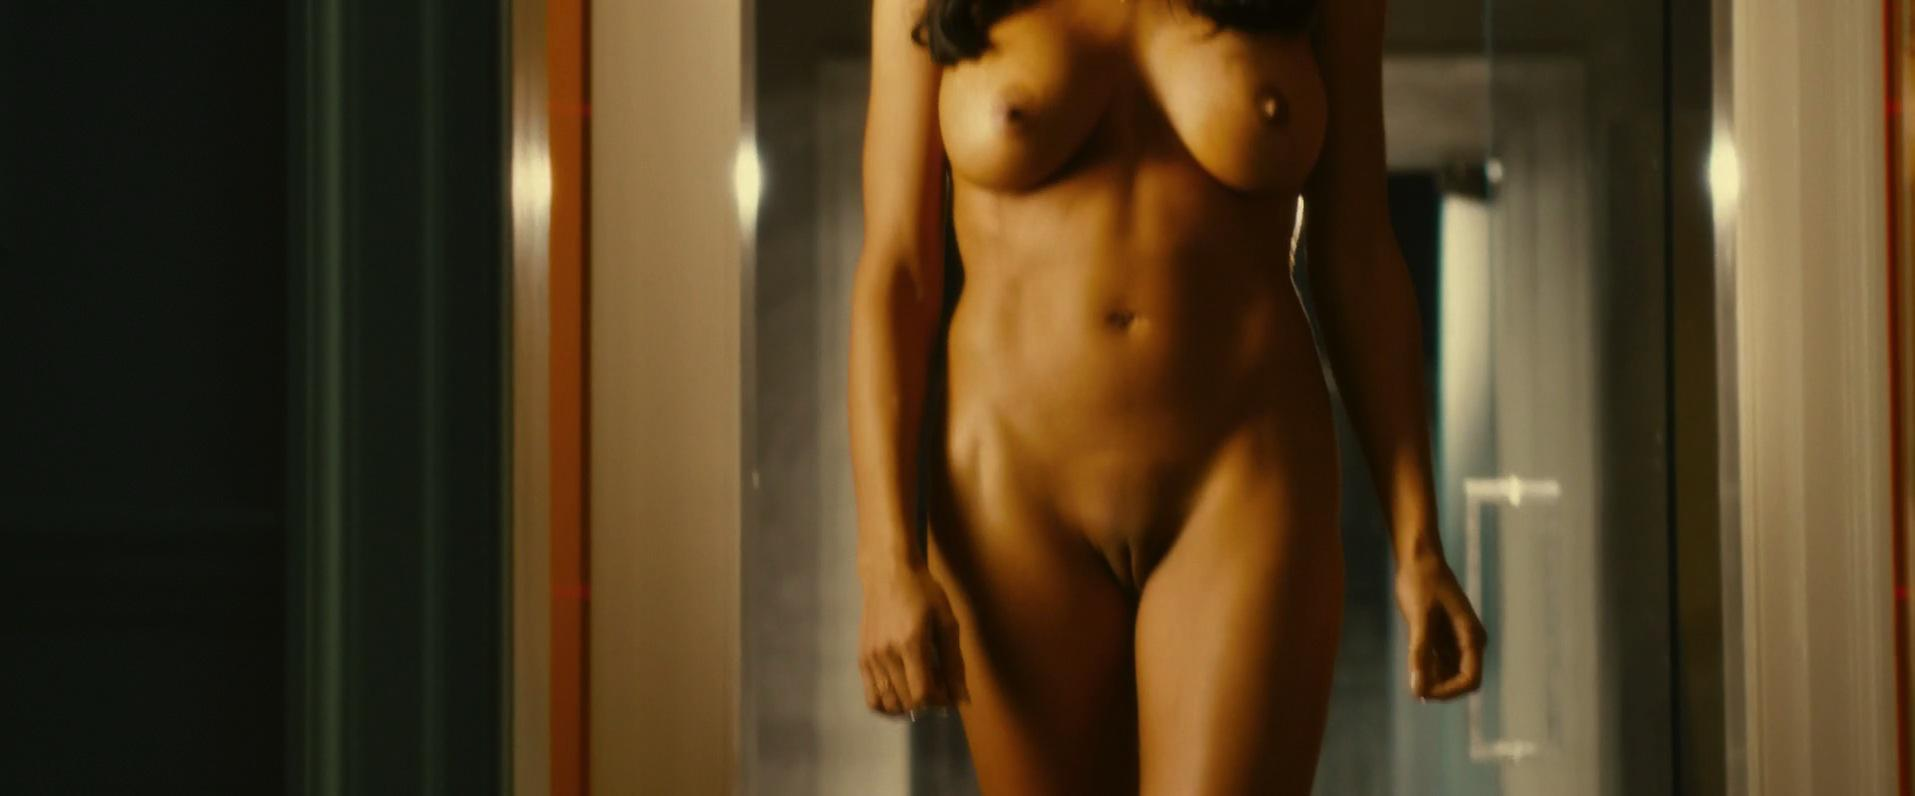 Rosario dawson boobs real